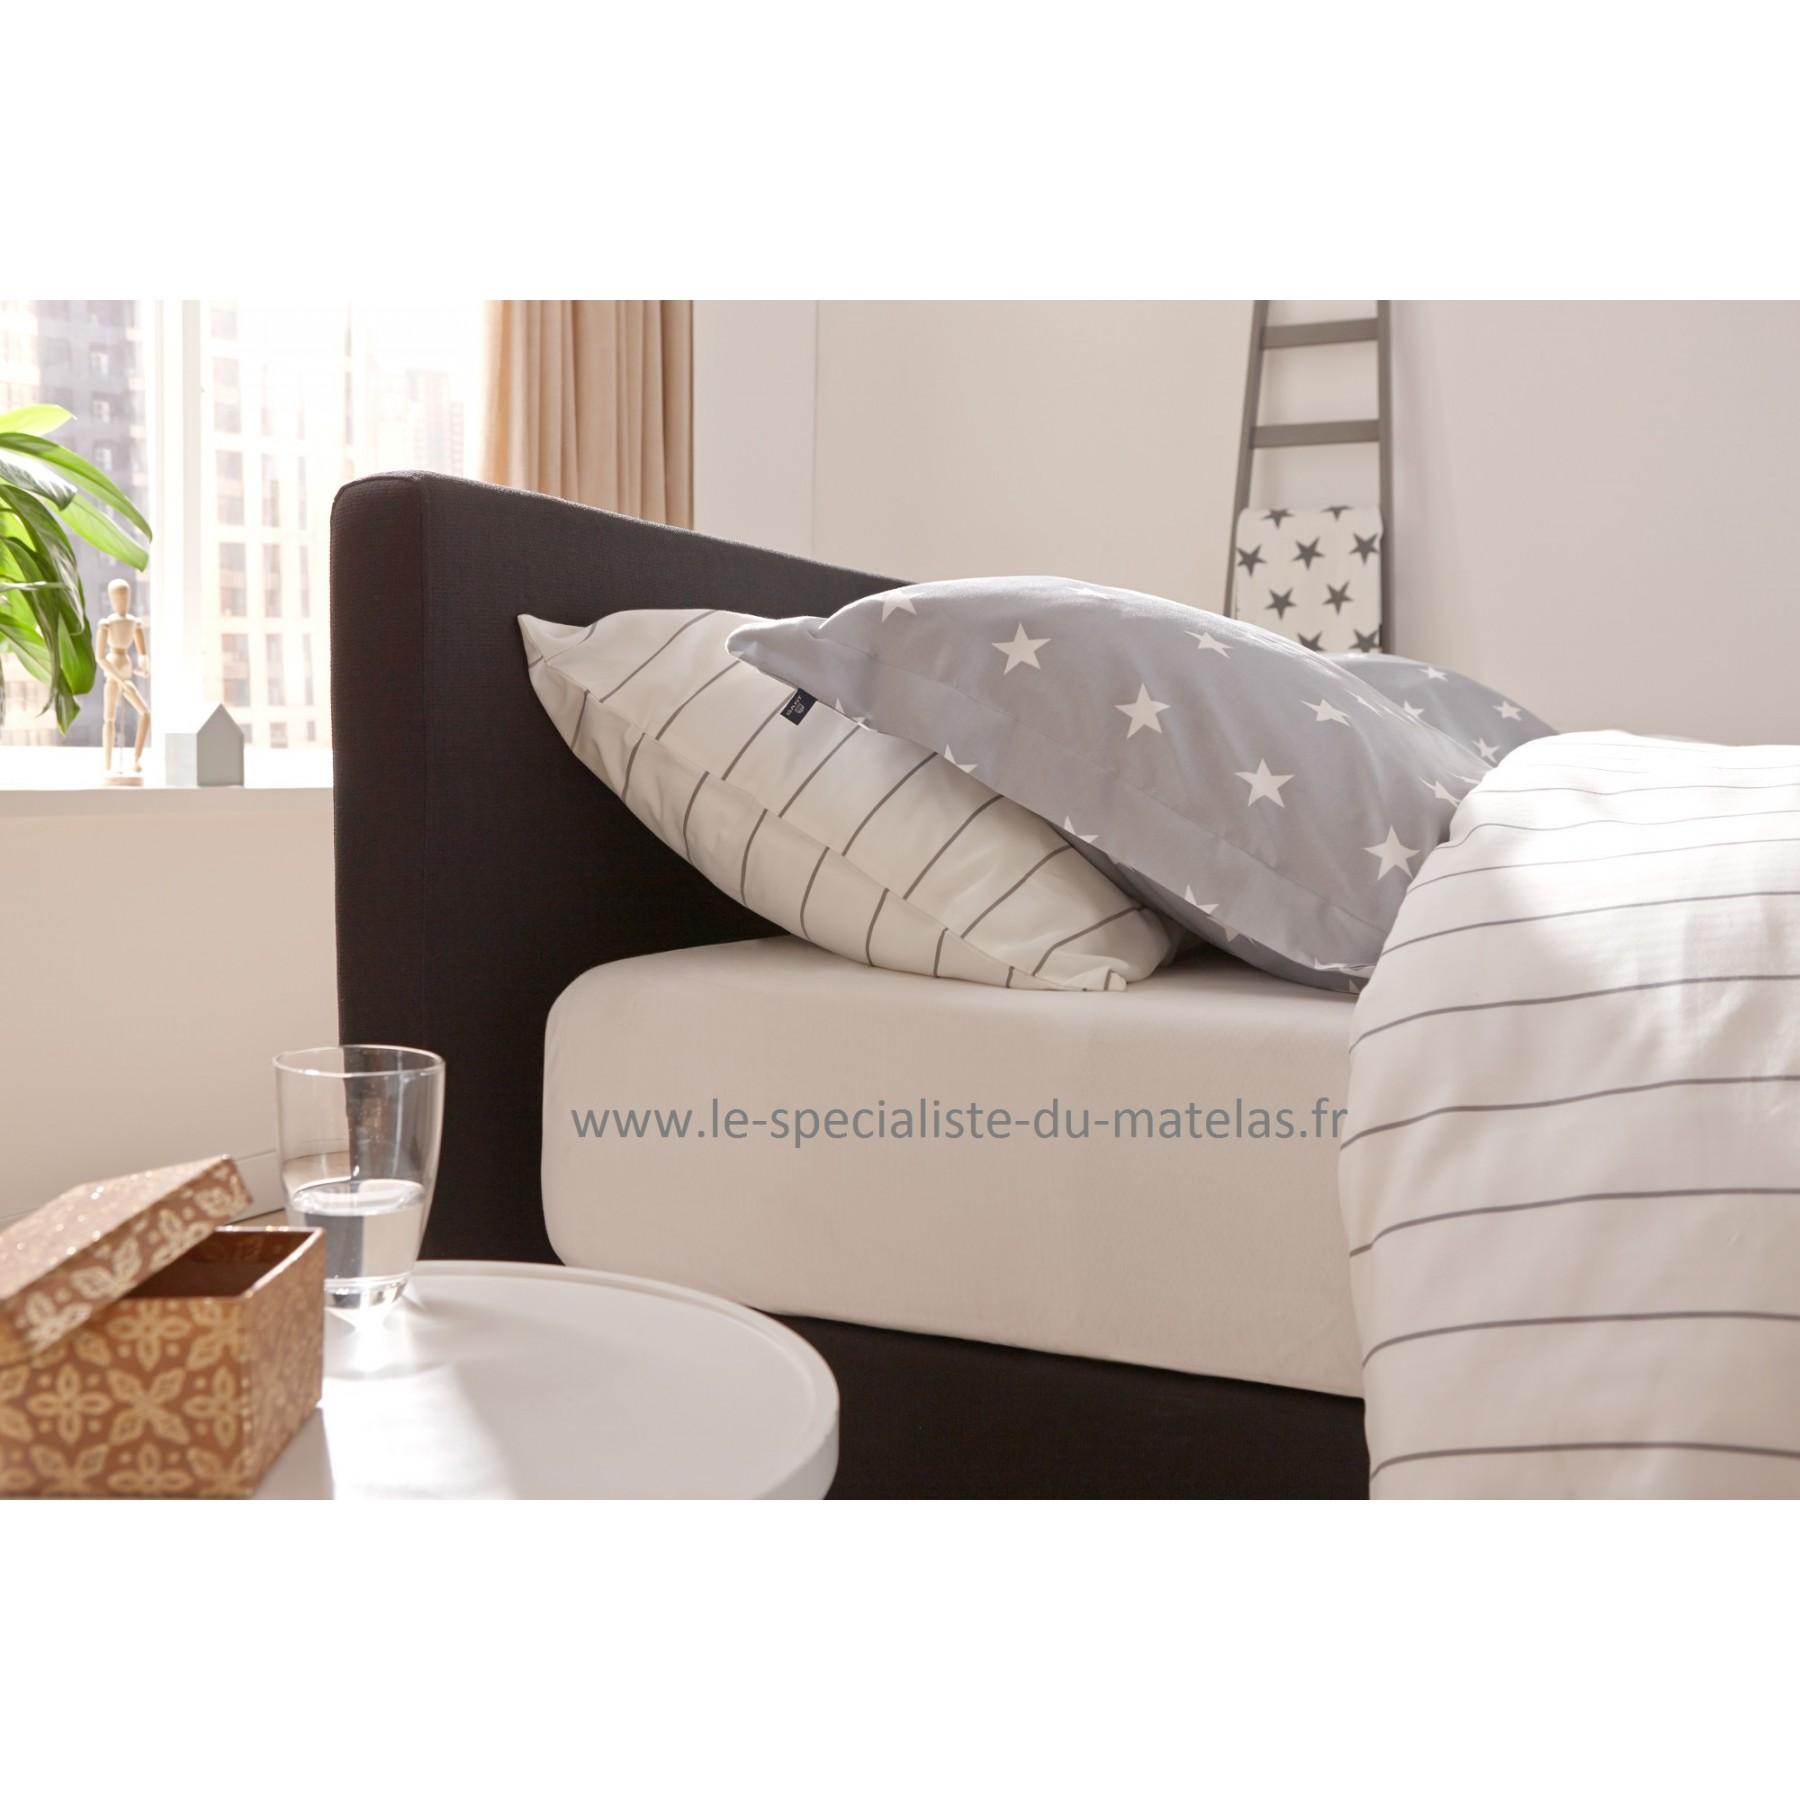 lit tempur zero g avec matelas tempur. Black Bedroom Furniture Sets. Home Design Ideas